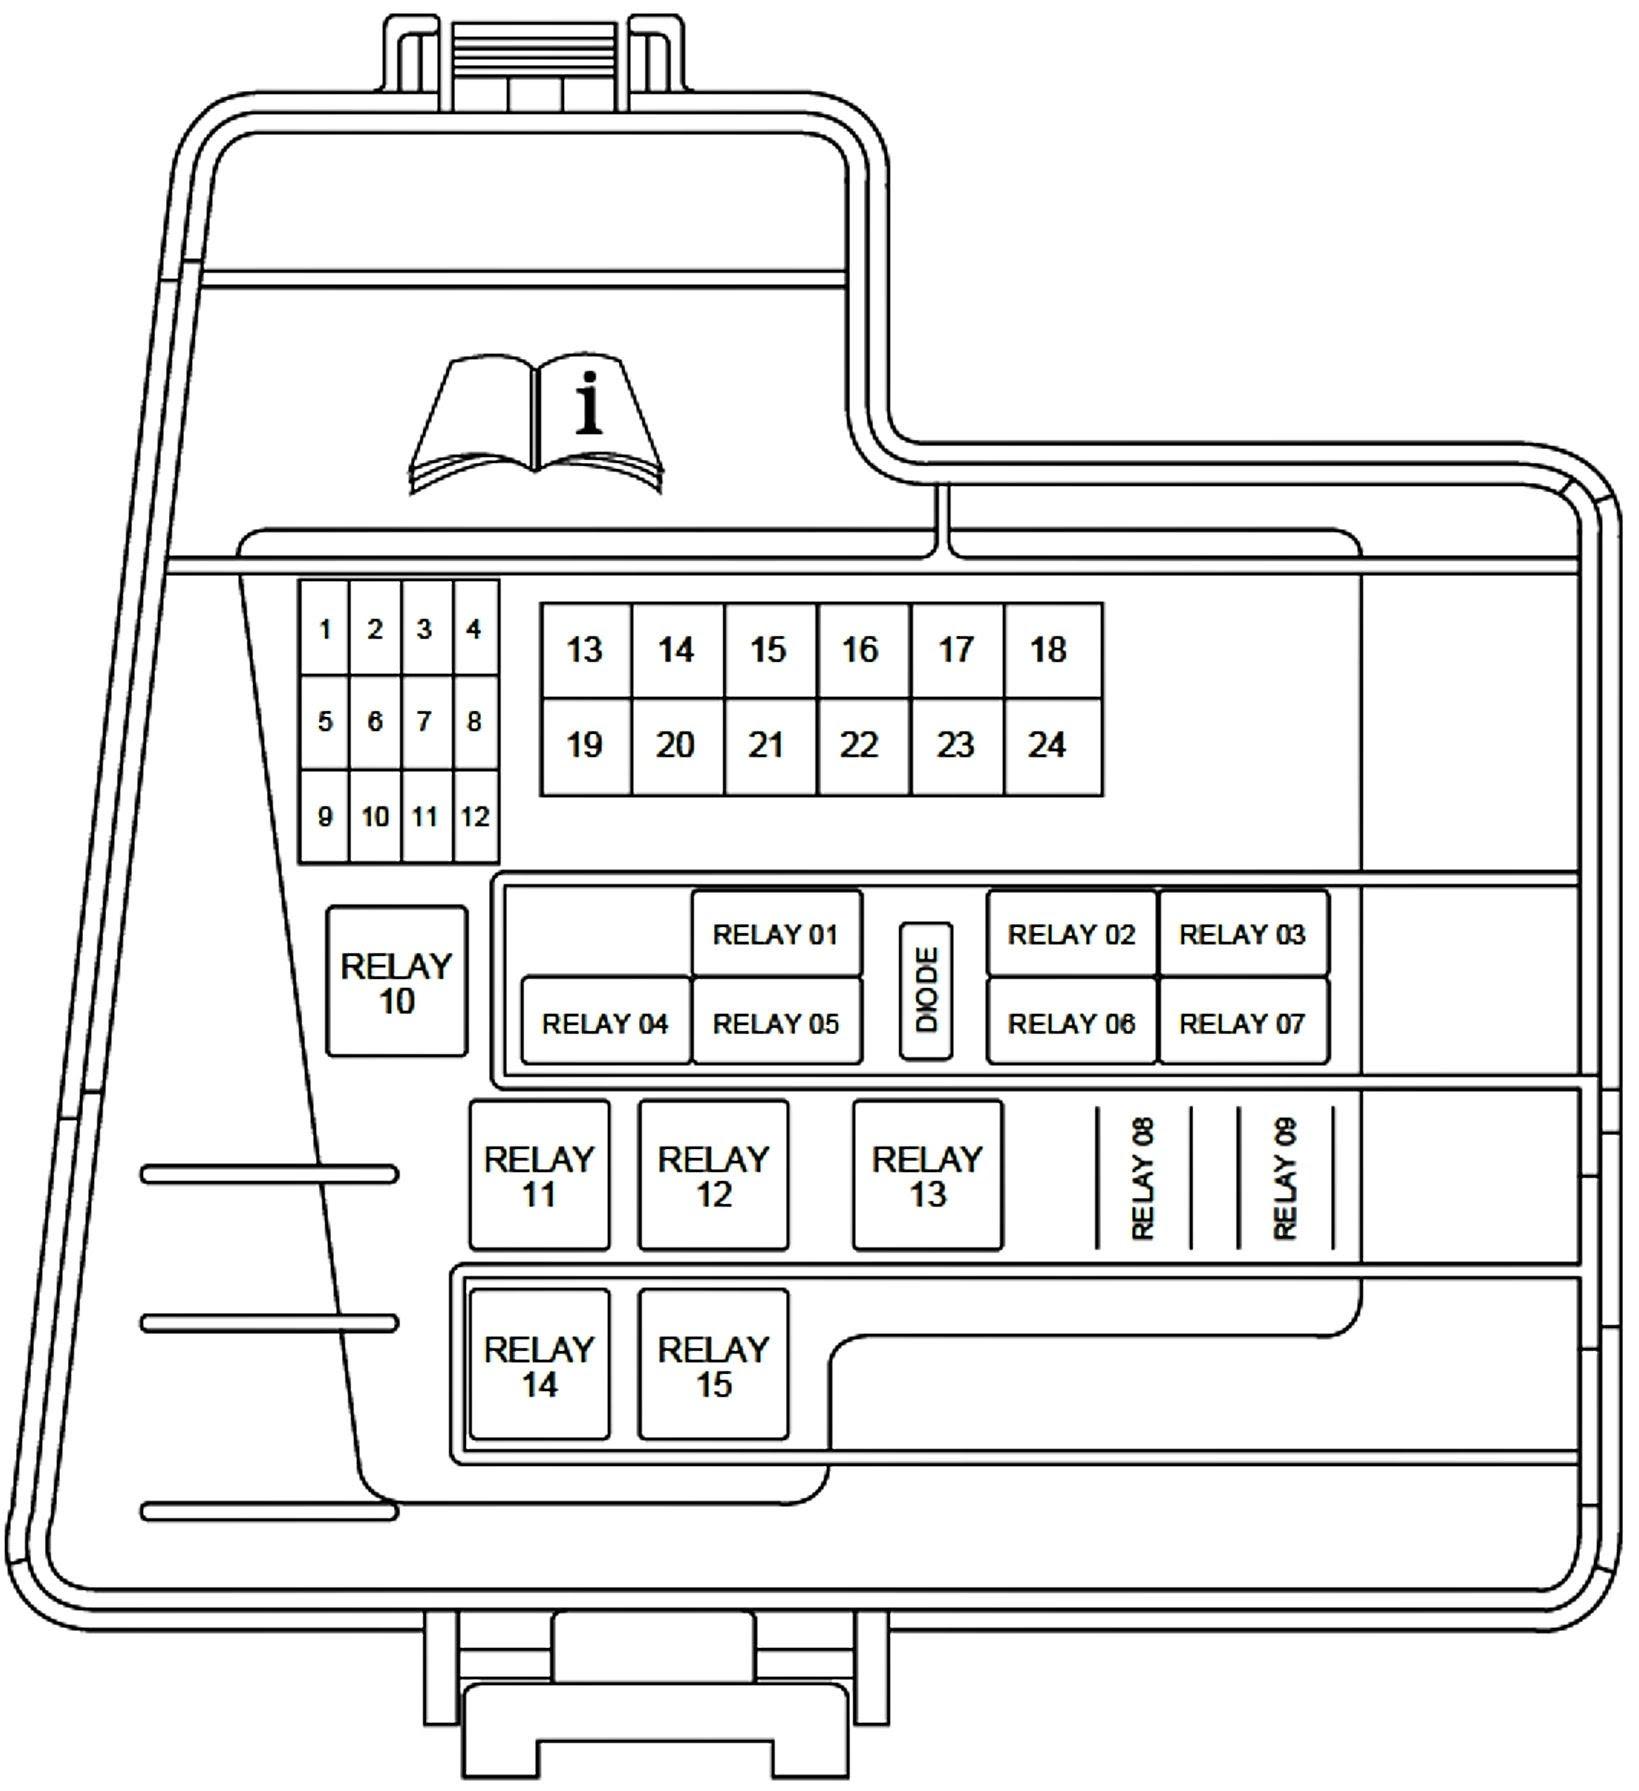 Diagram Rover 25 Fuse Box Diagram Full Version Hd Quality Box Diagram Diagramarrons Brunisport It